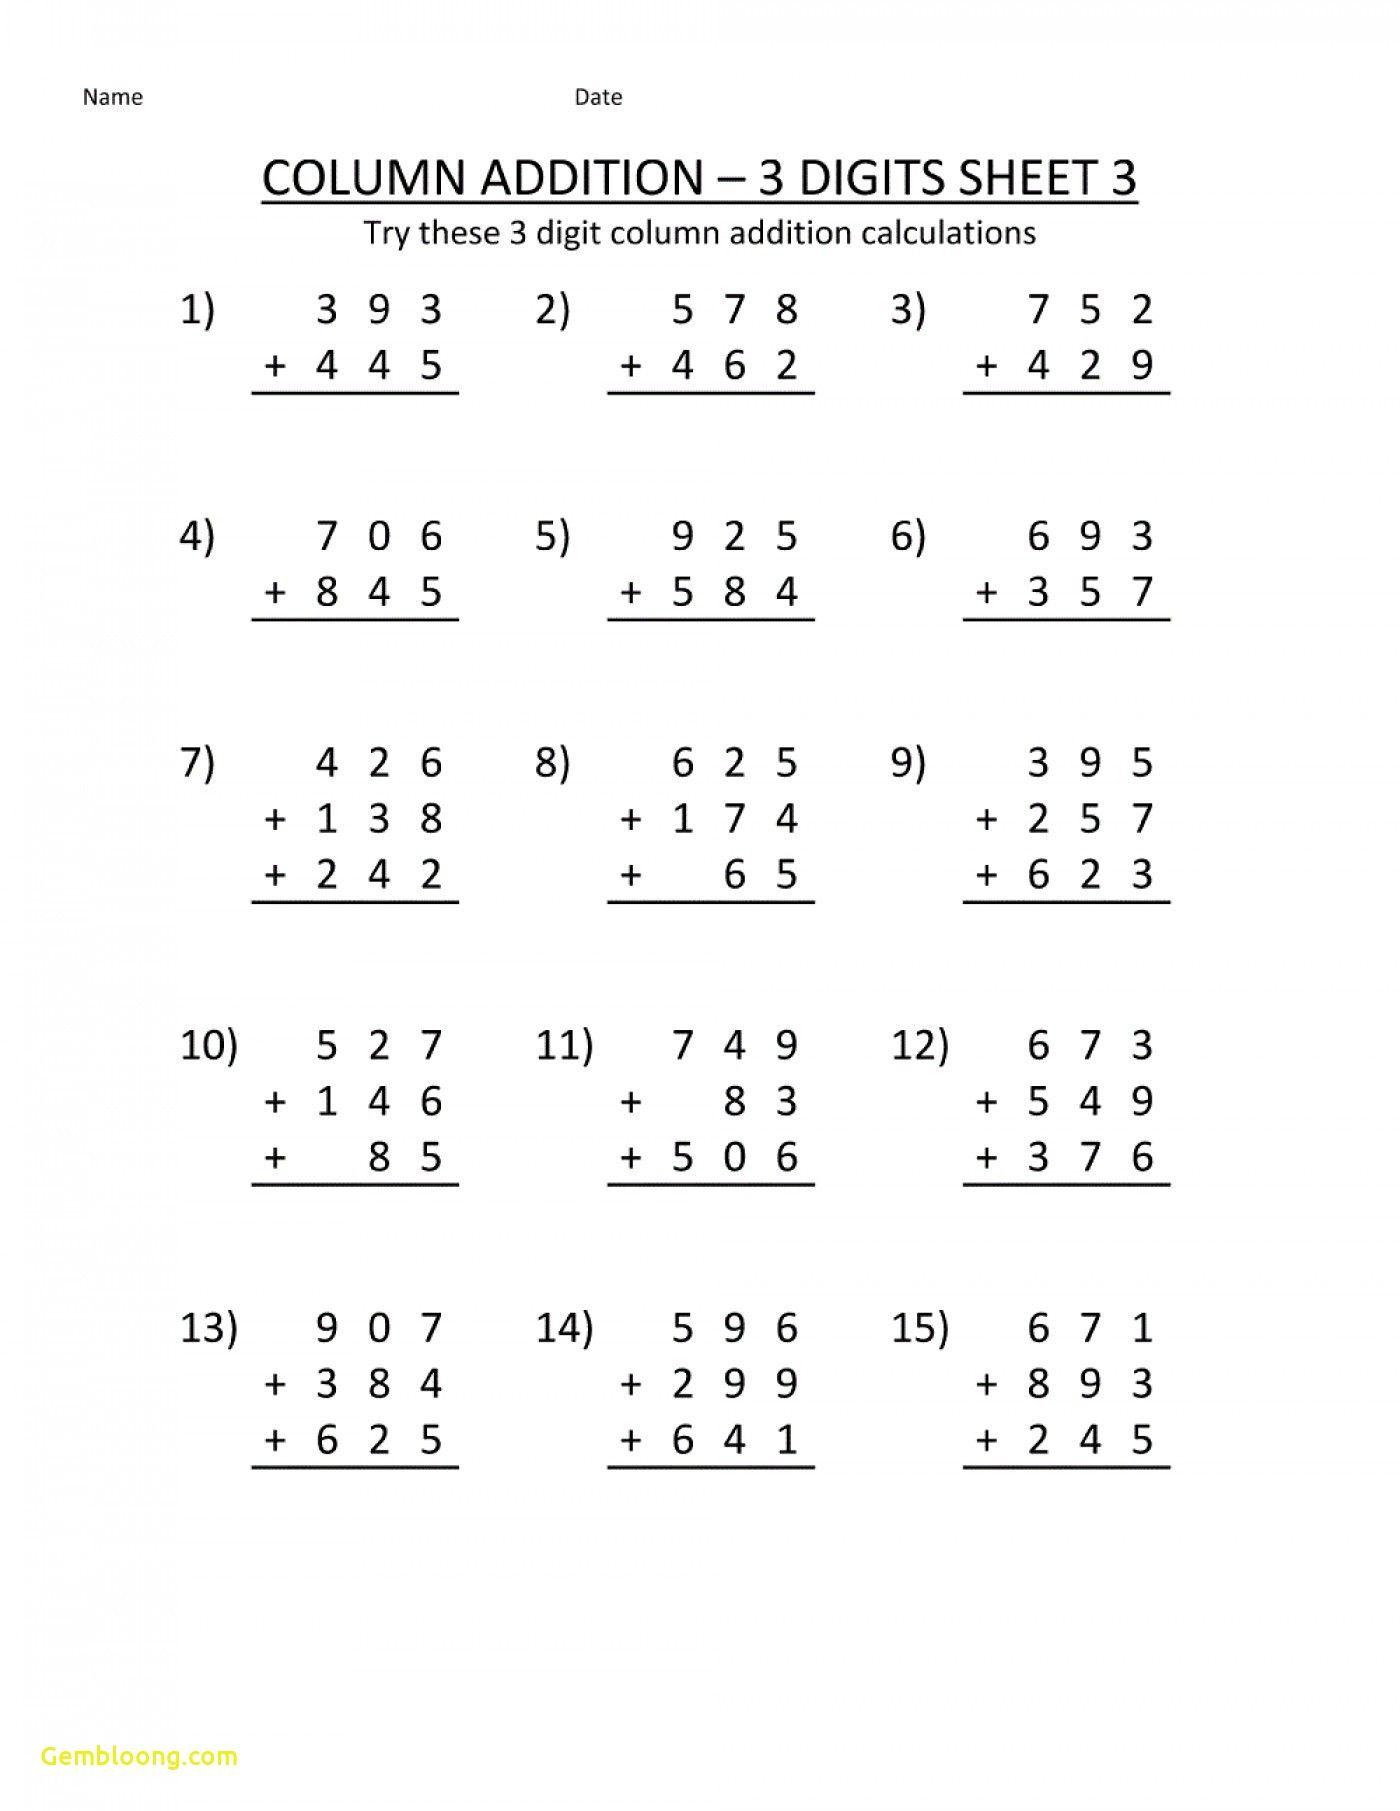 Legal Free Printable Math Worksheets For 2nd Grade Addition Worksheet Printable In 2020 Math Addition Worksheets Free Math Worksheets Free Printable Math Worksheets